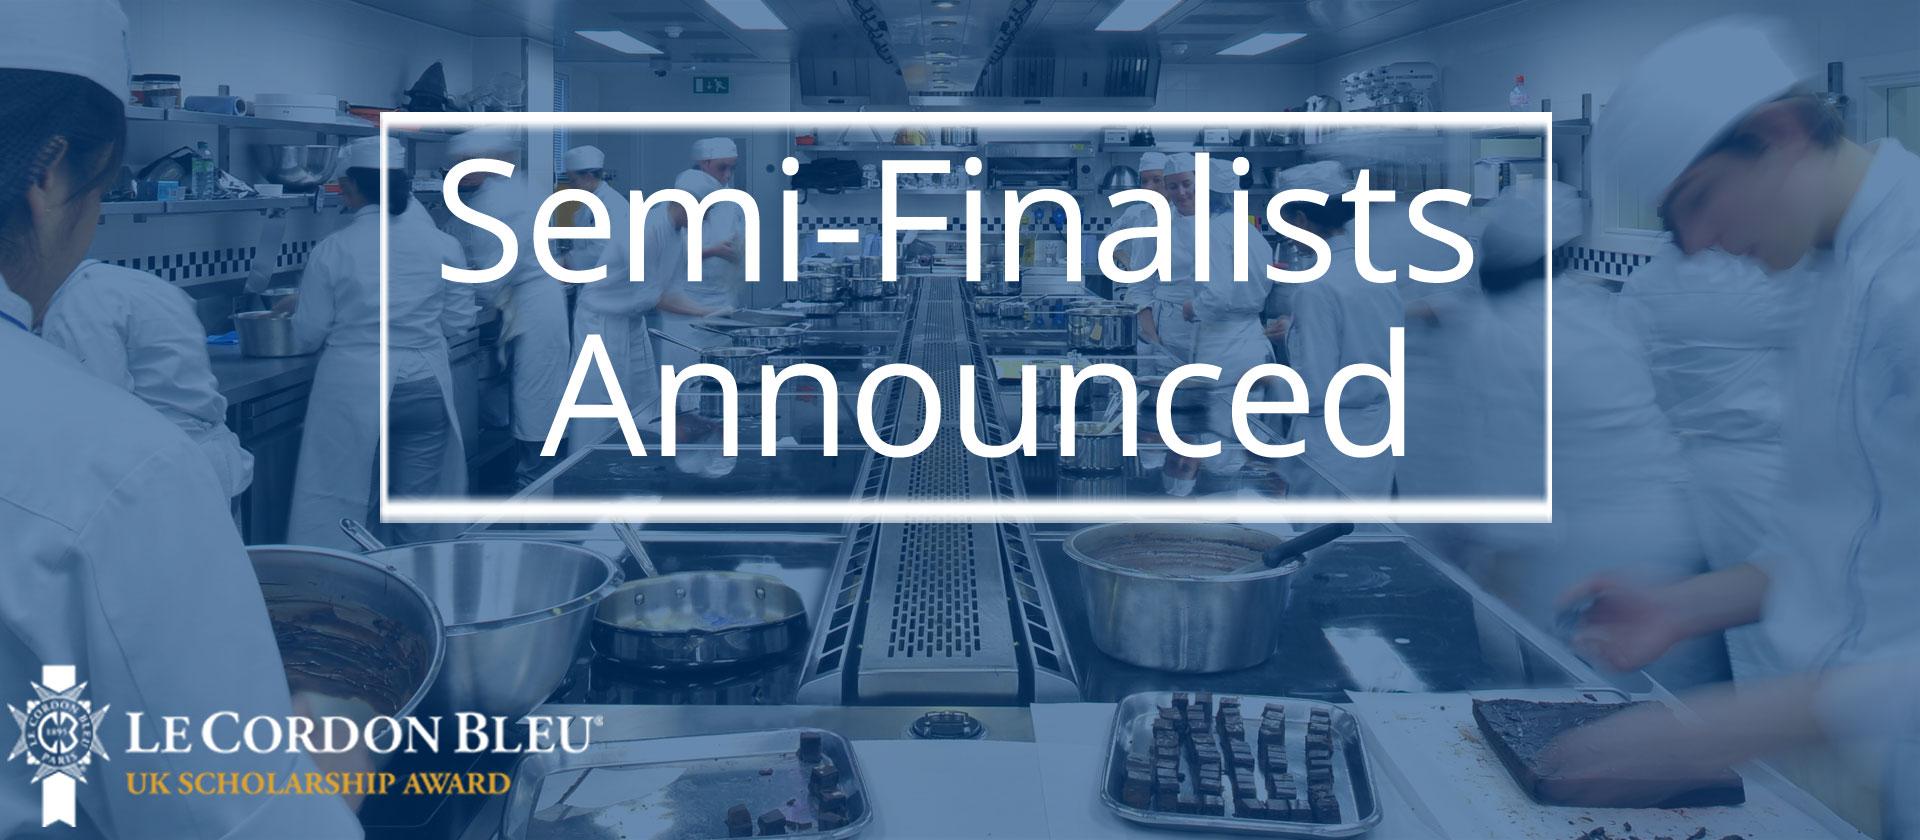 UK Scholarship Award 2016 The Semi-Finalists Announced